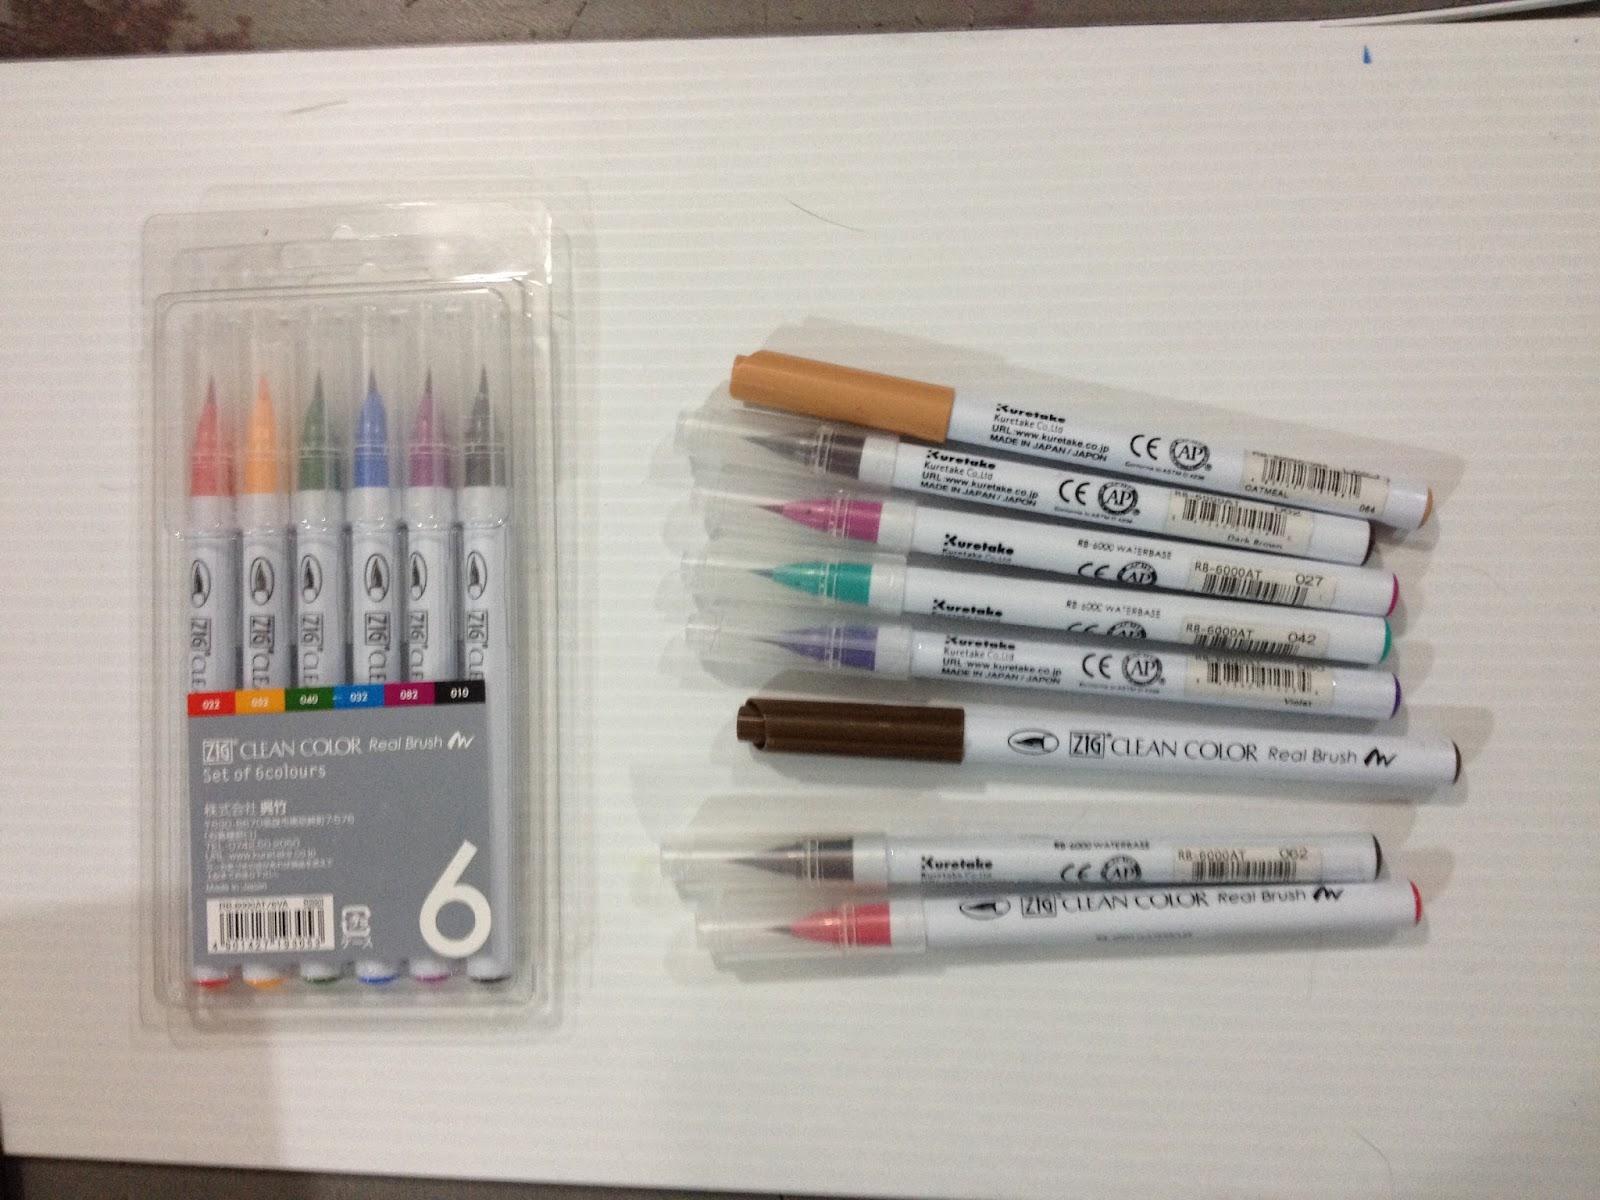 Nattosoup Studio Art And Process Blog Watercolor Marker